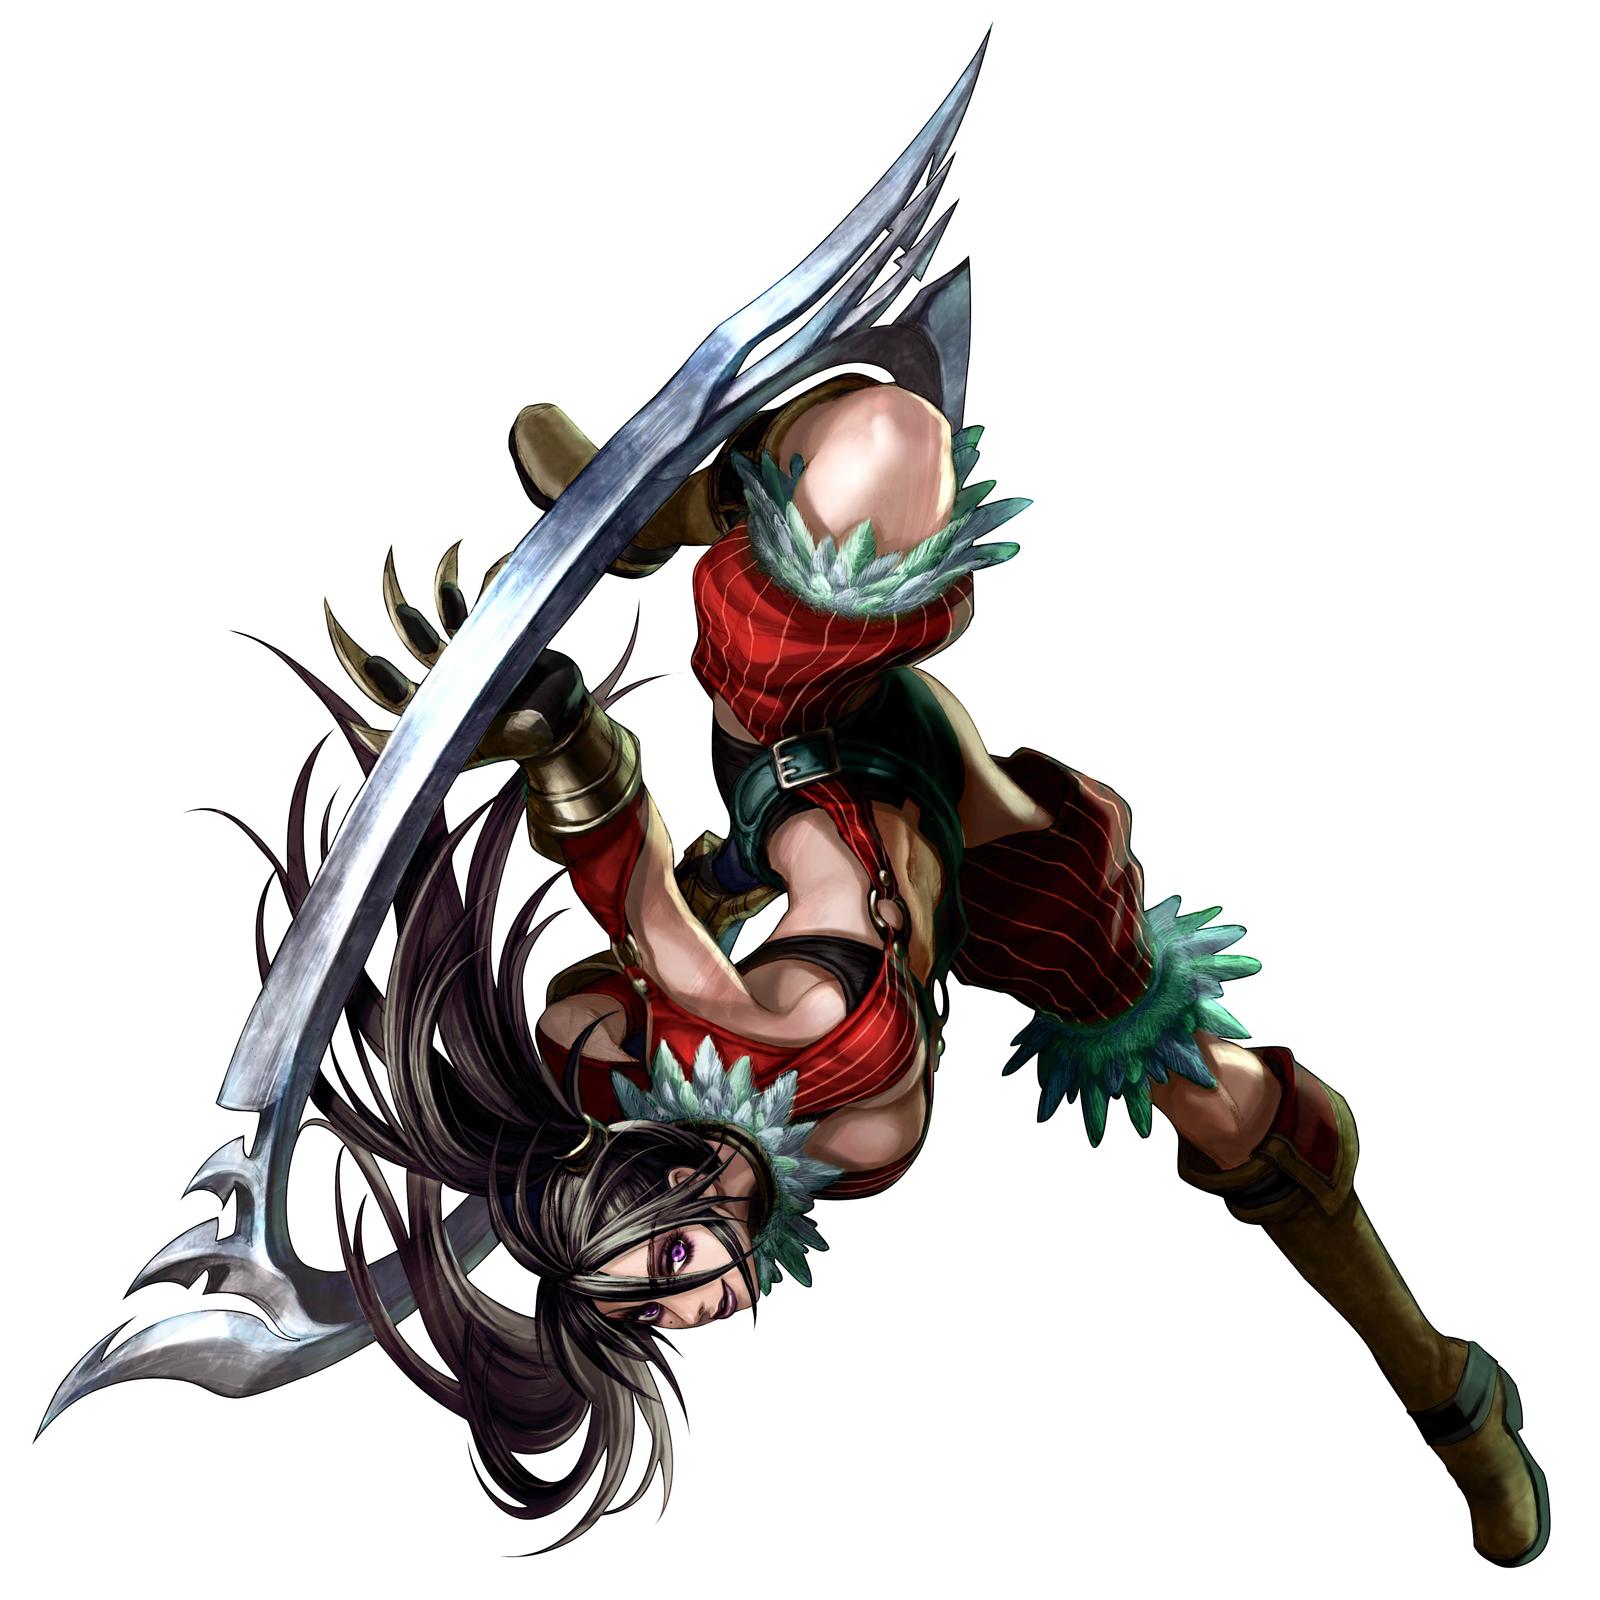 4 Pics 1 Anime Characters : Tira soul calibur